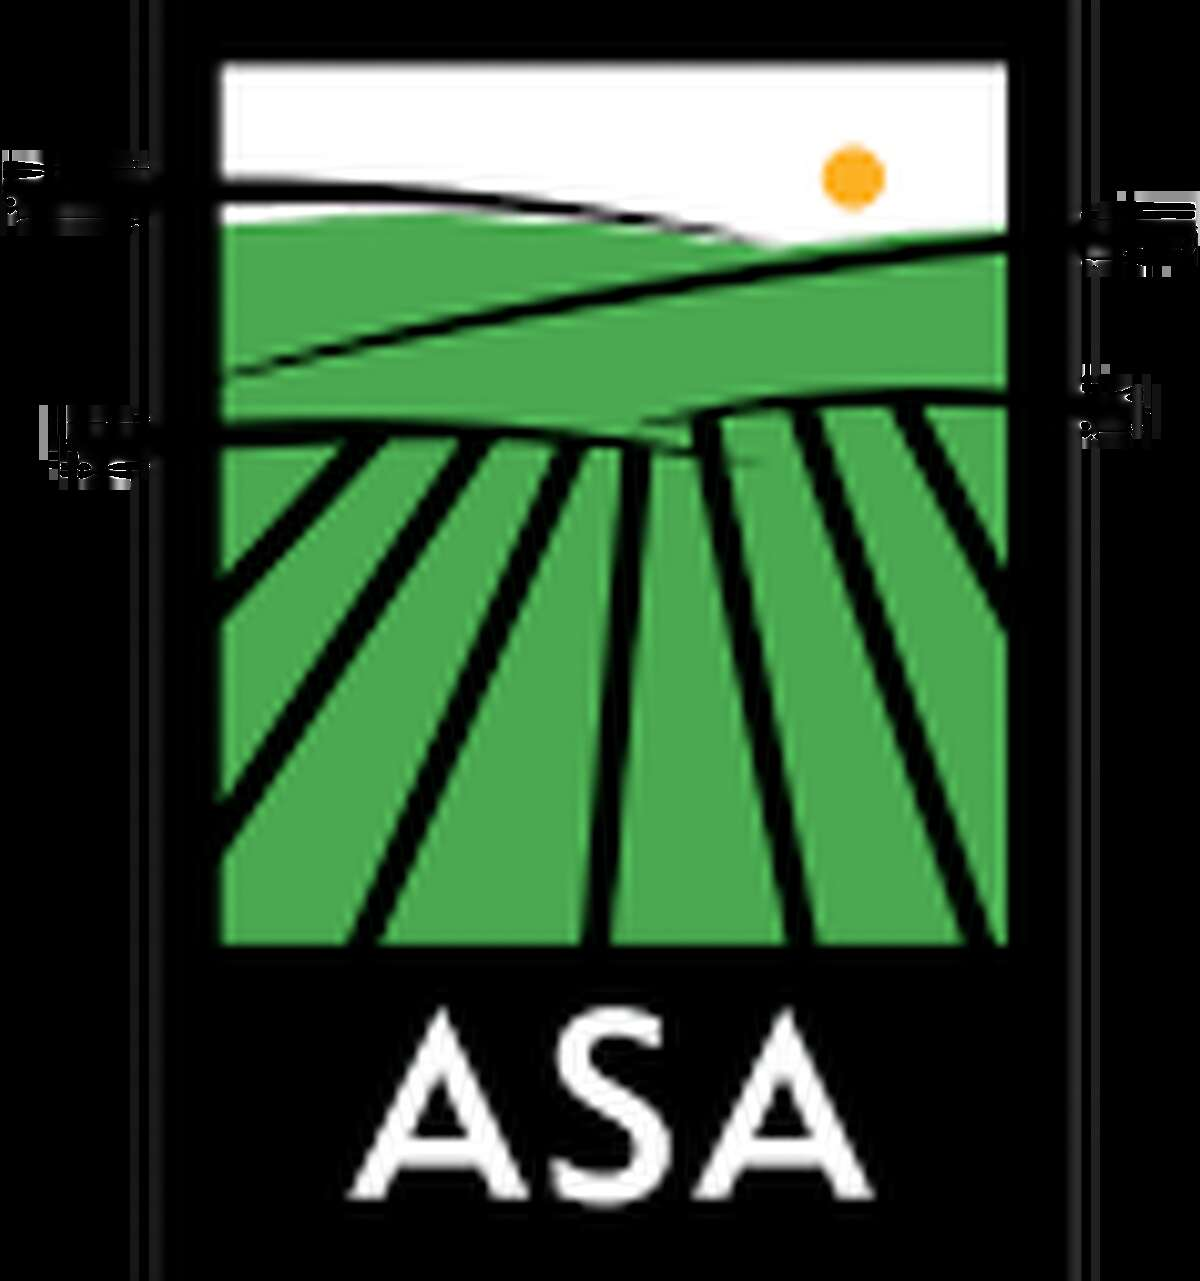 Agricultural Stewardship Association logo.